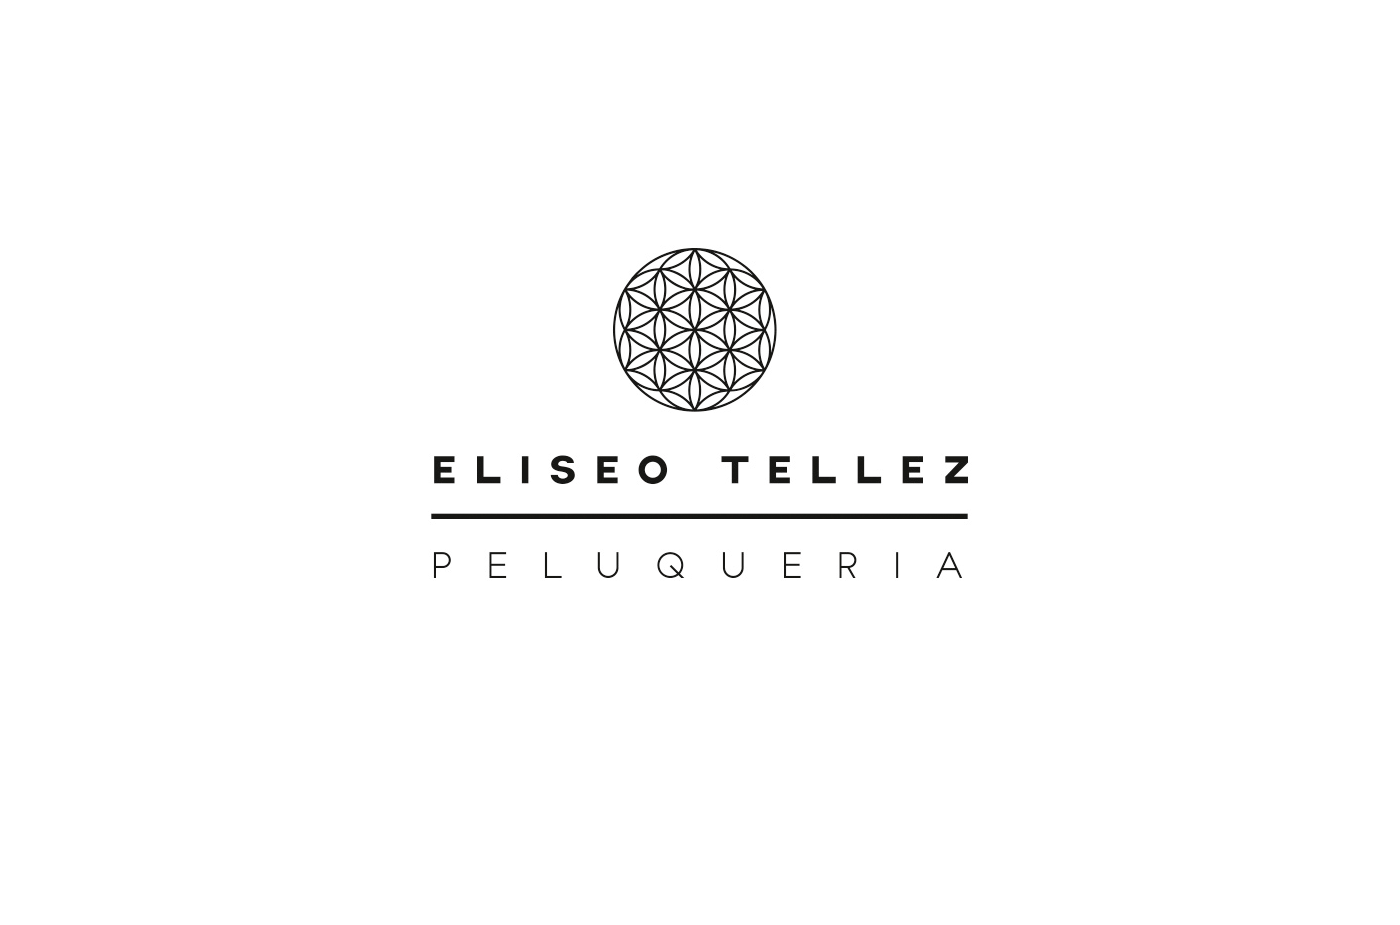 Eliseo-Tellez-peluqueria-LOGO-blanco